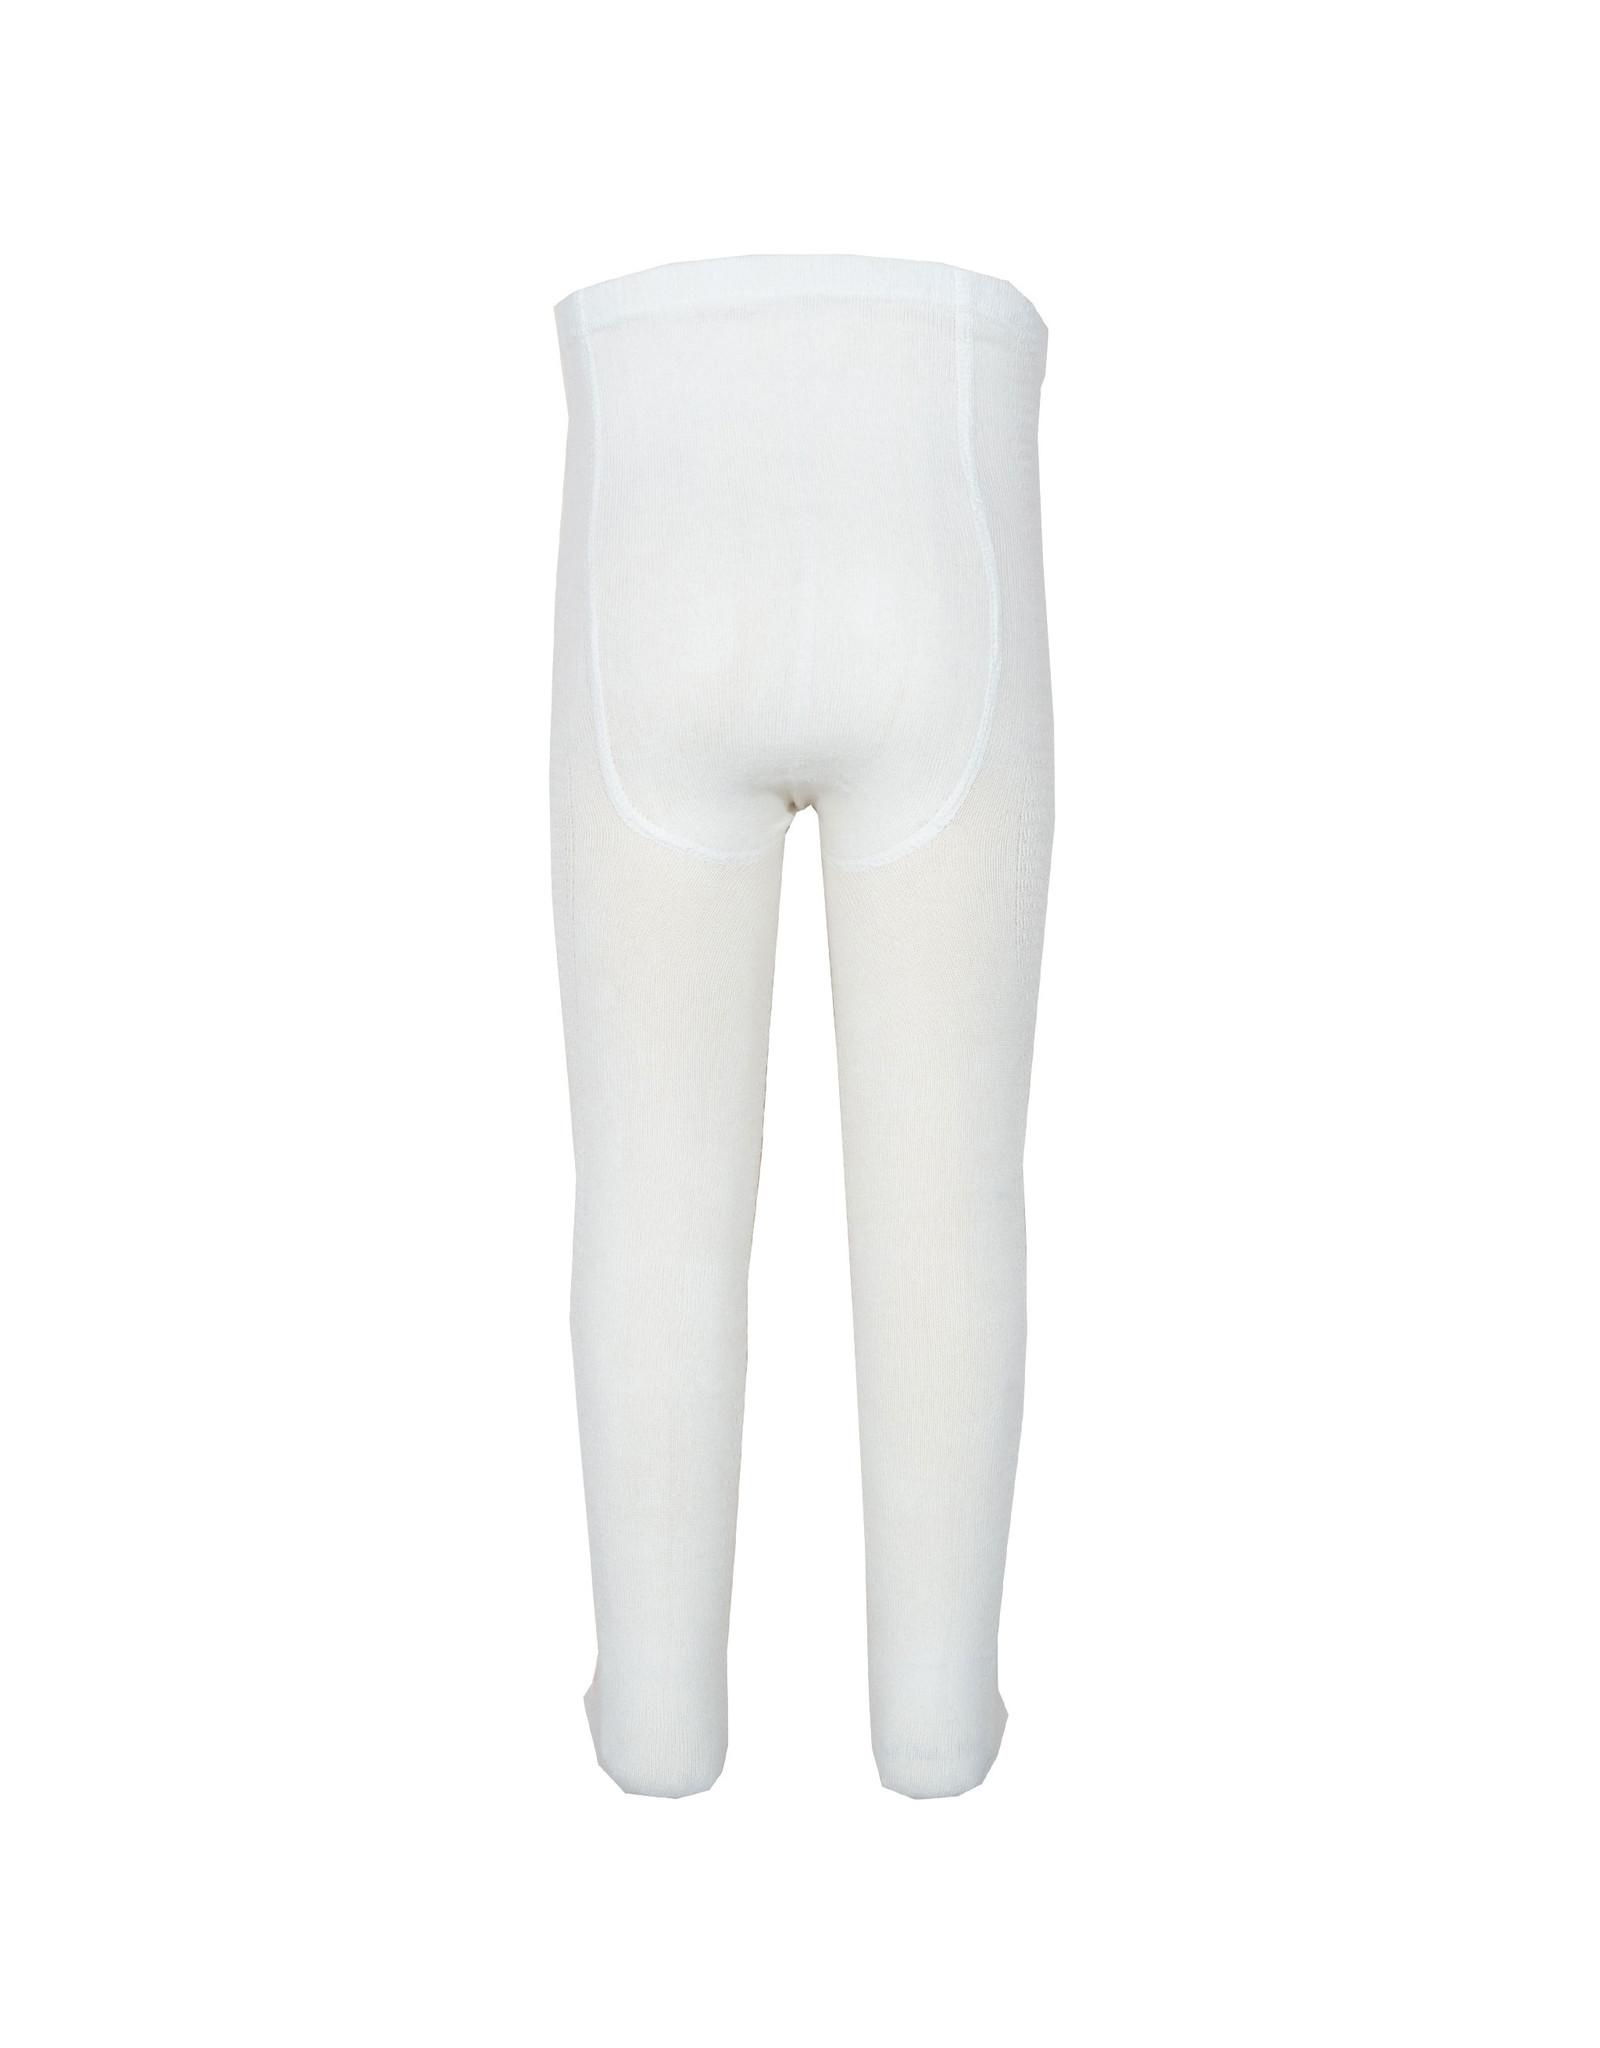 Kite Clothing Side Stitch Tights - Cream